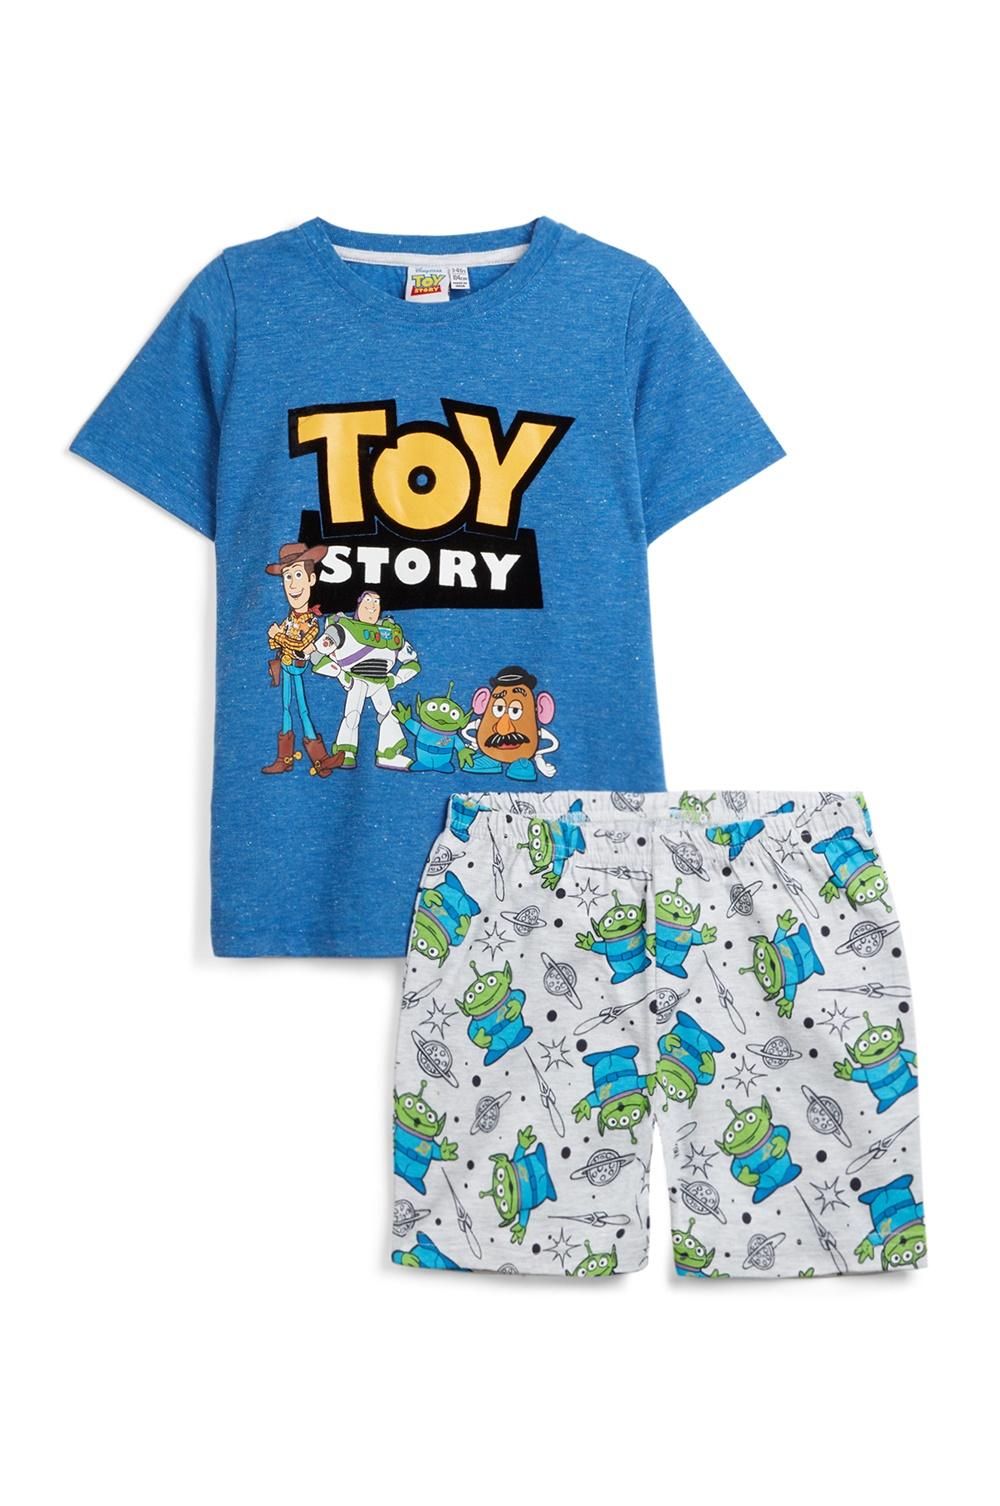 baratas para descuento fa7cb 984af Pijama para niños Toy Story - PRIMARK Catálogo Online